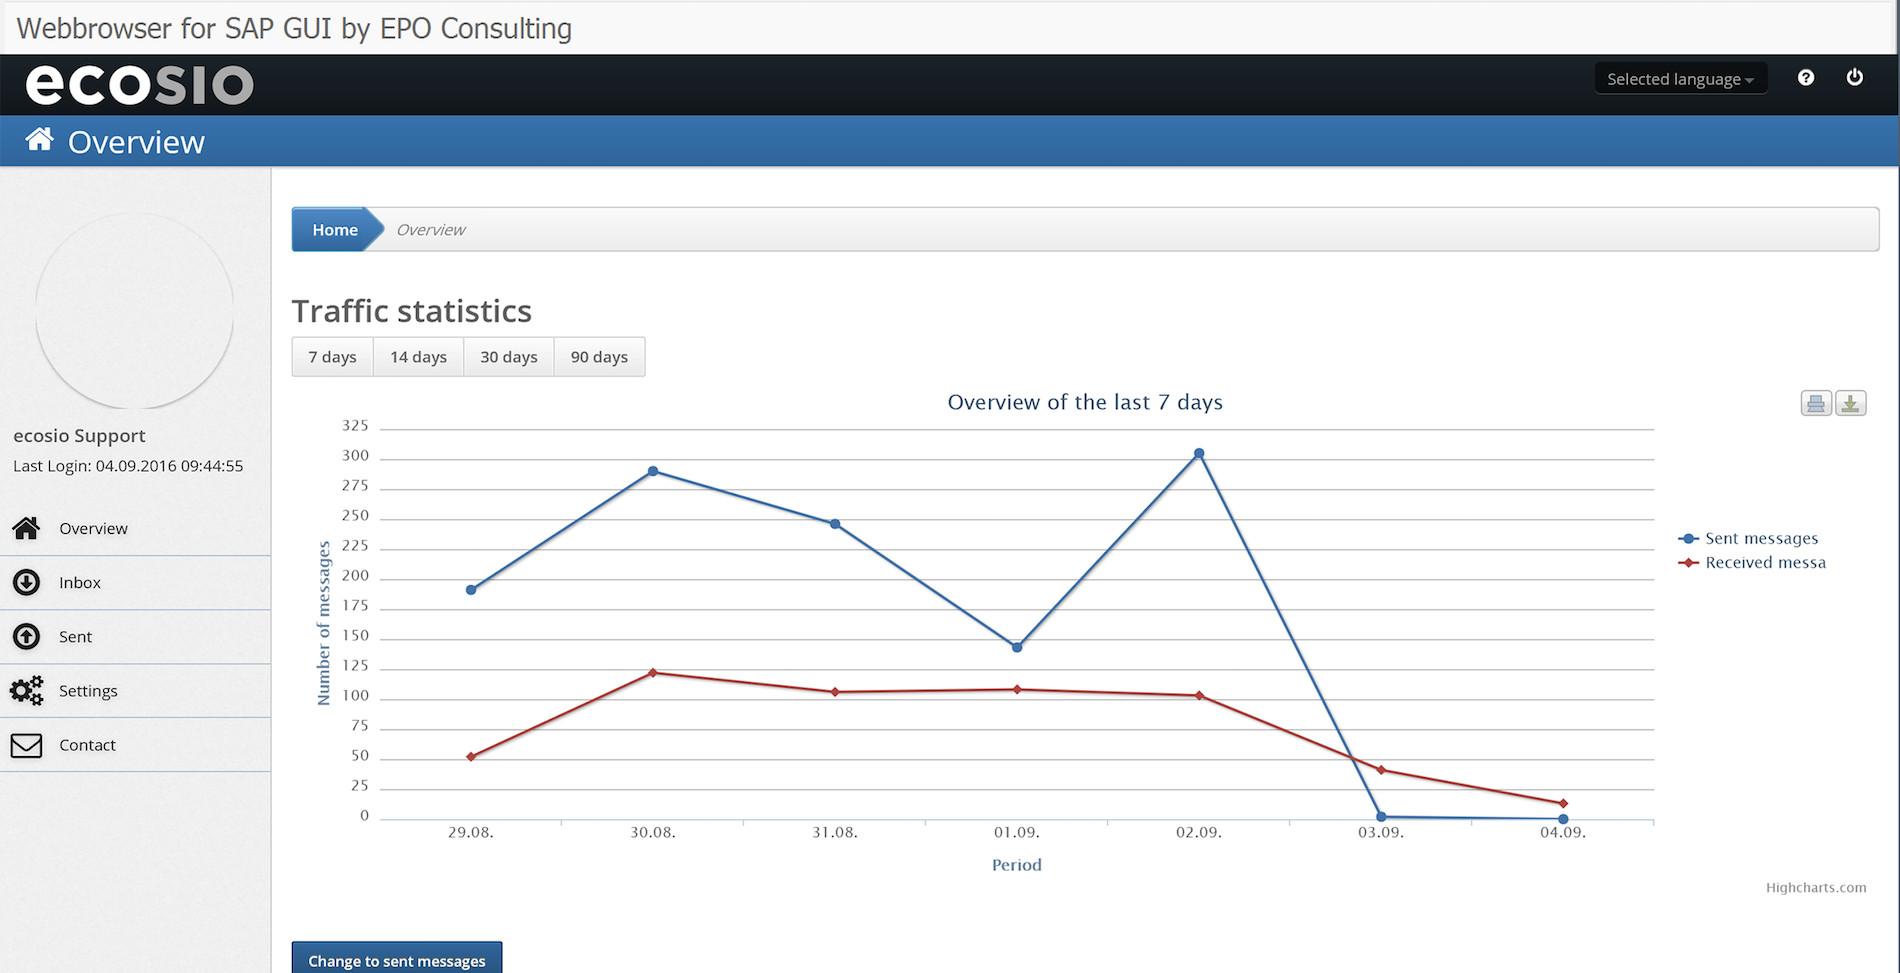 ecosio.Monitor als eigene SAP-Transaktion